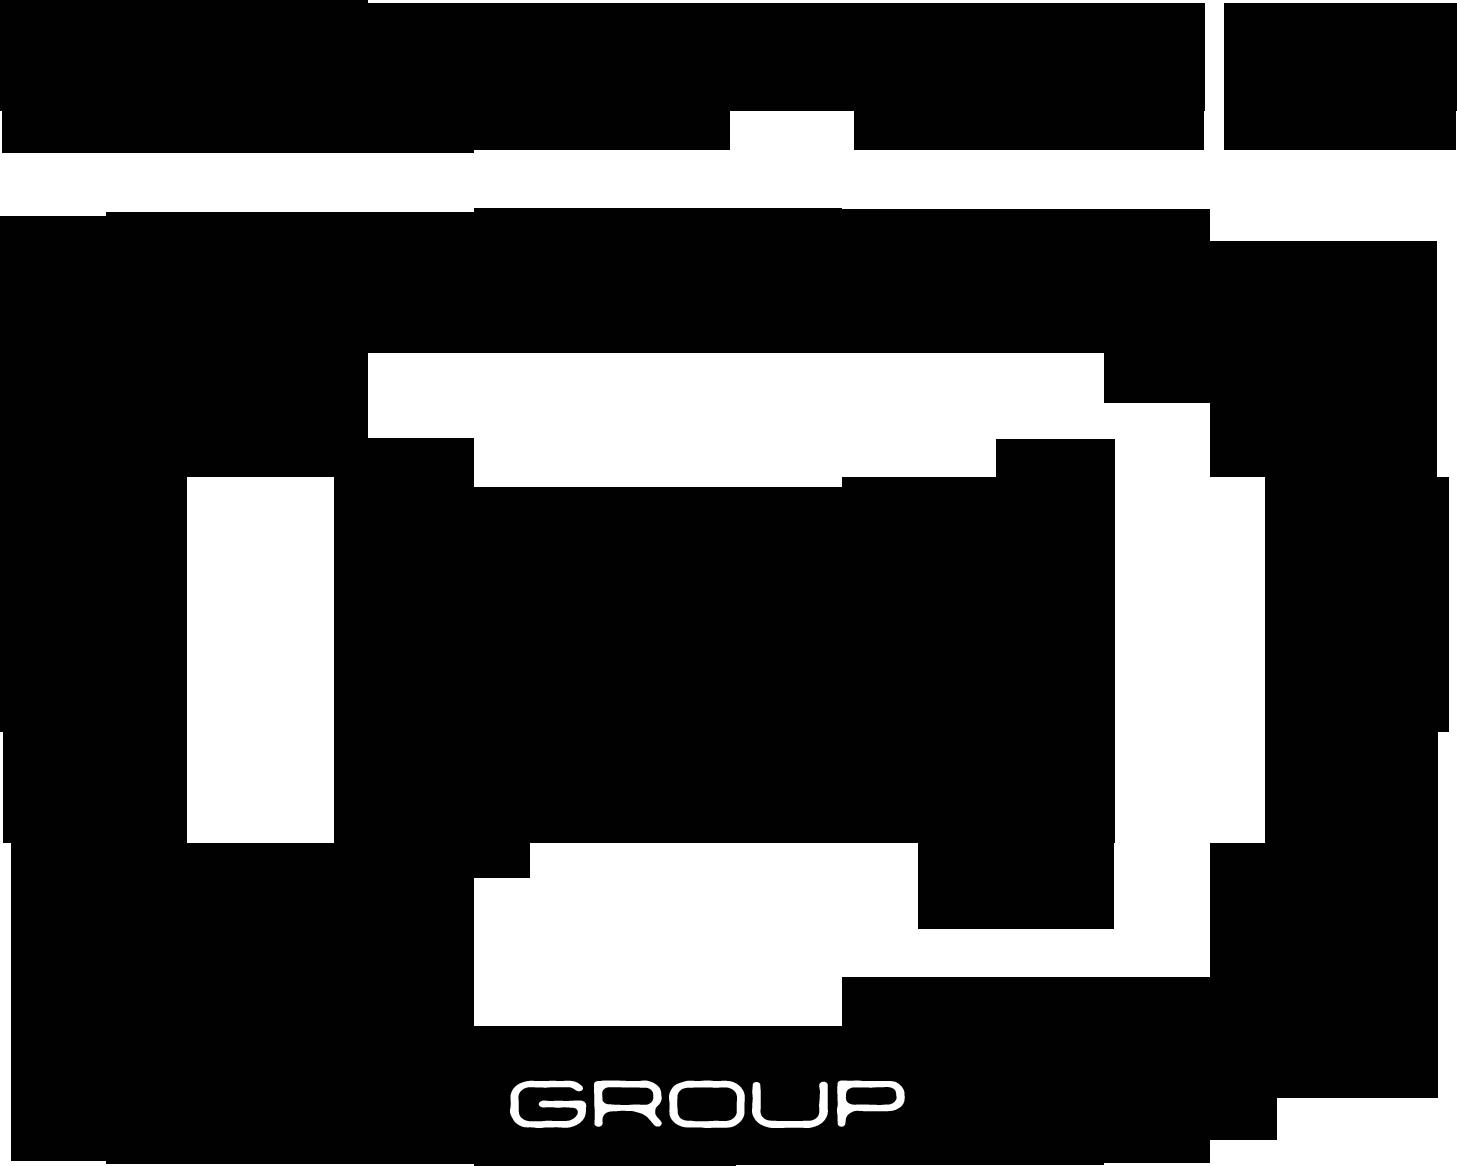 Конкурс на разработку логотипа для компании Dantex Group  фото f_2915bff4d697bb7d.png